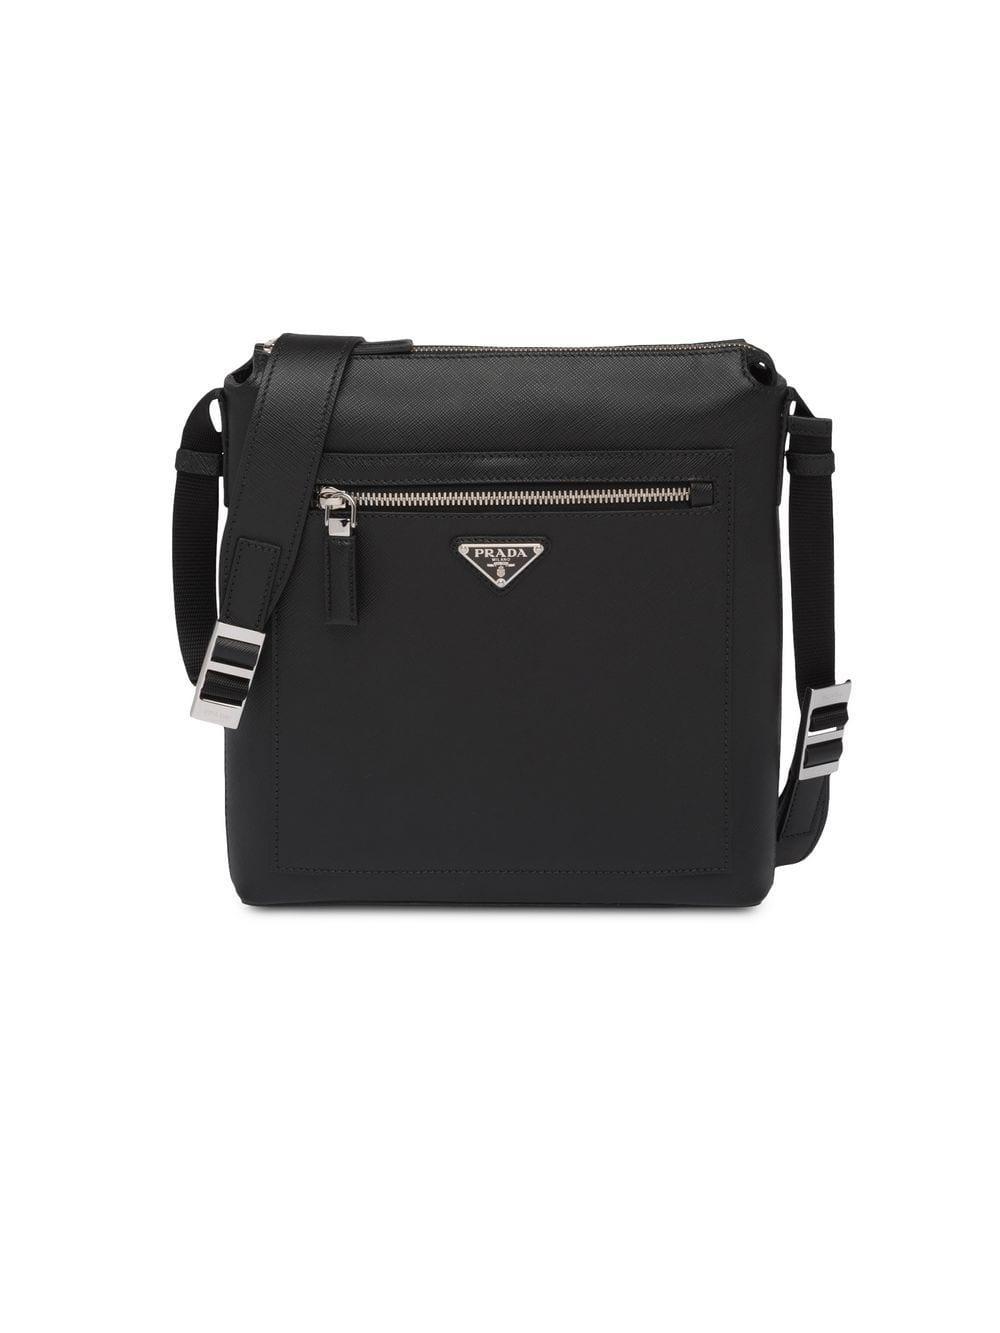 dc9a144aedcb81 Prada - Black Saffiano Leather Shoulder Bag for Men - Lyst. View fullscreen